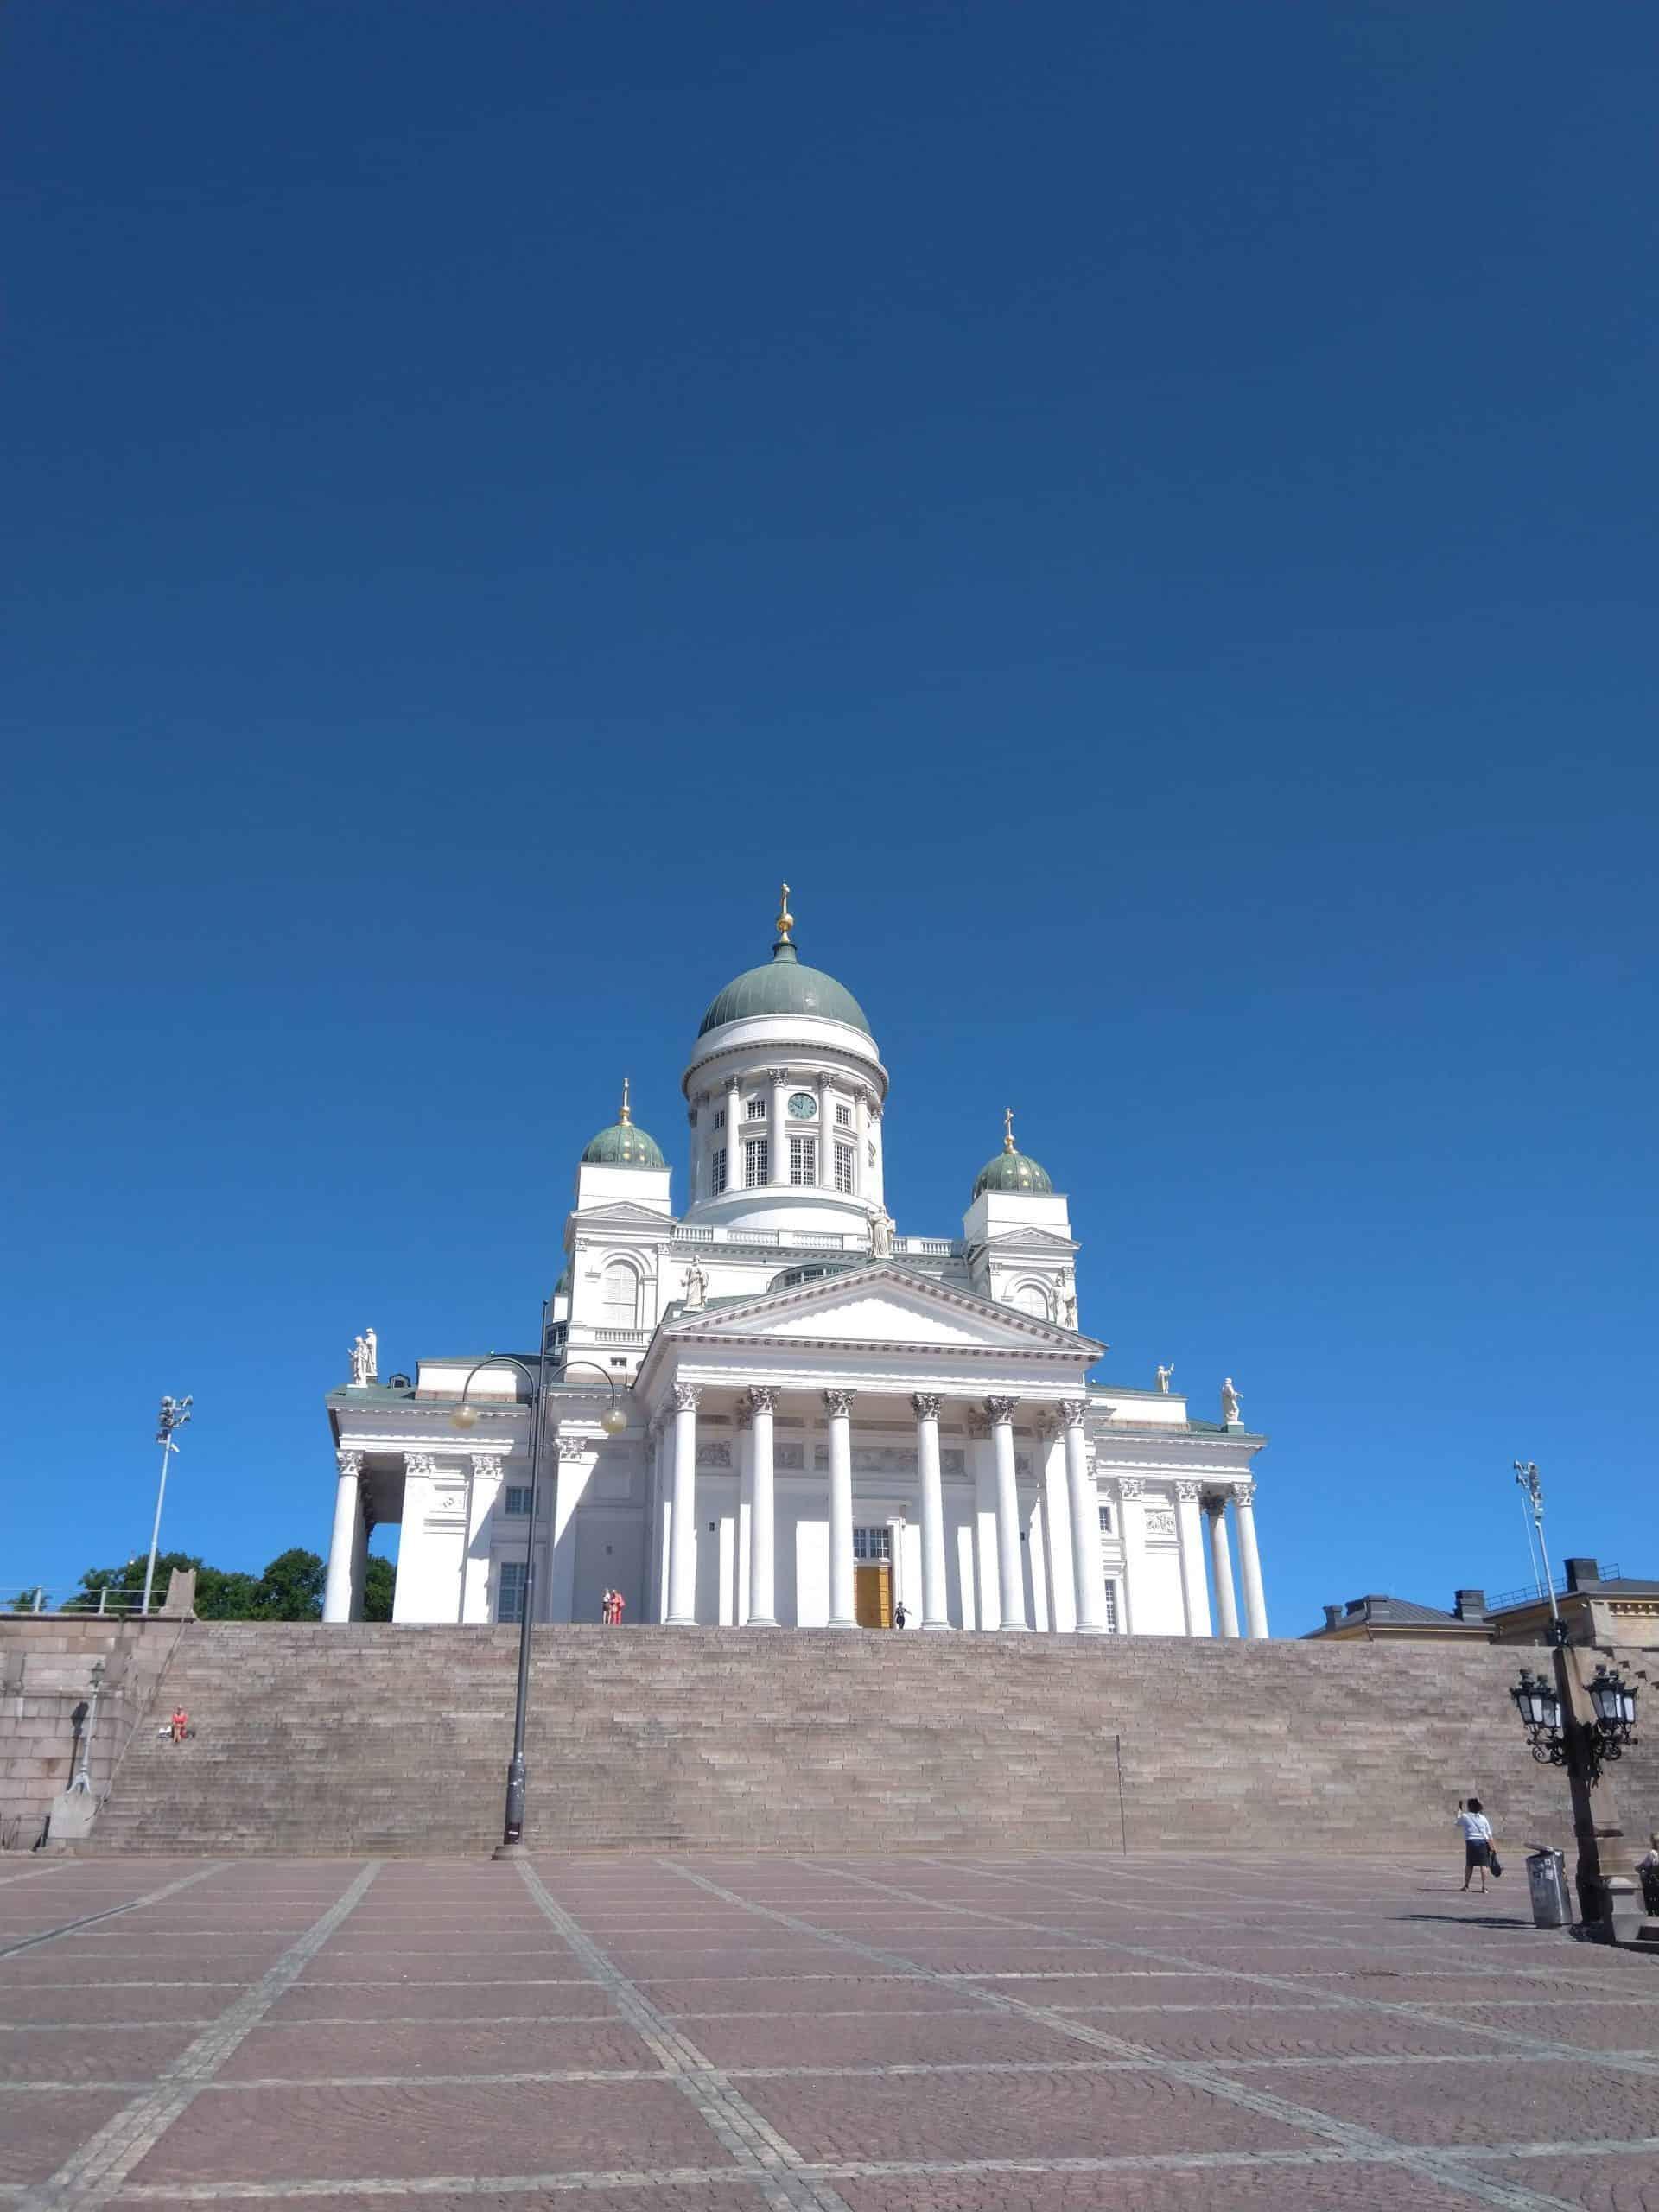 Helsinkitour_tourpoint2_helsinkicathedral